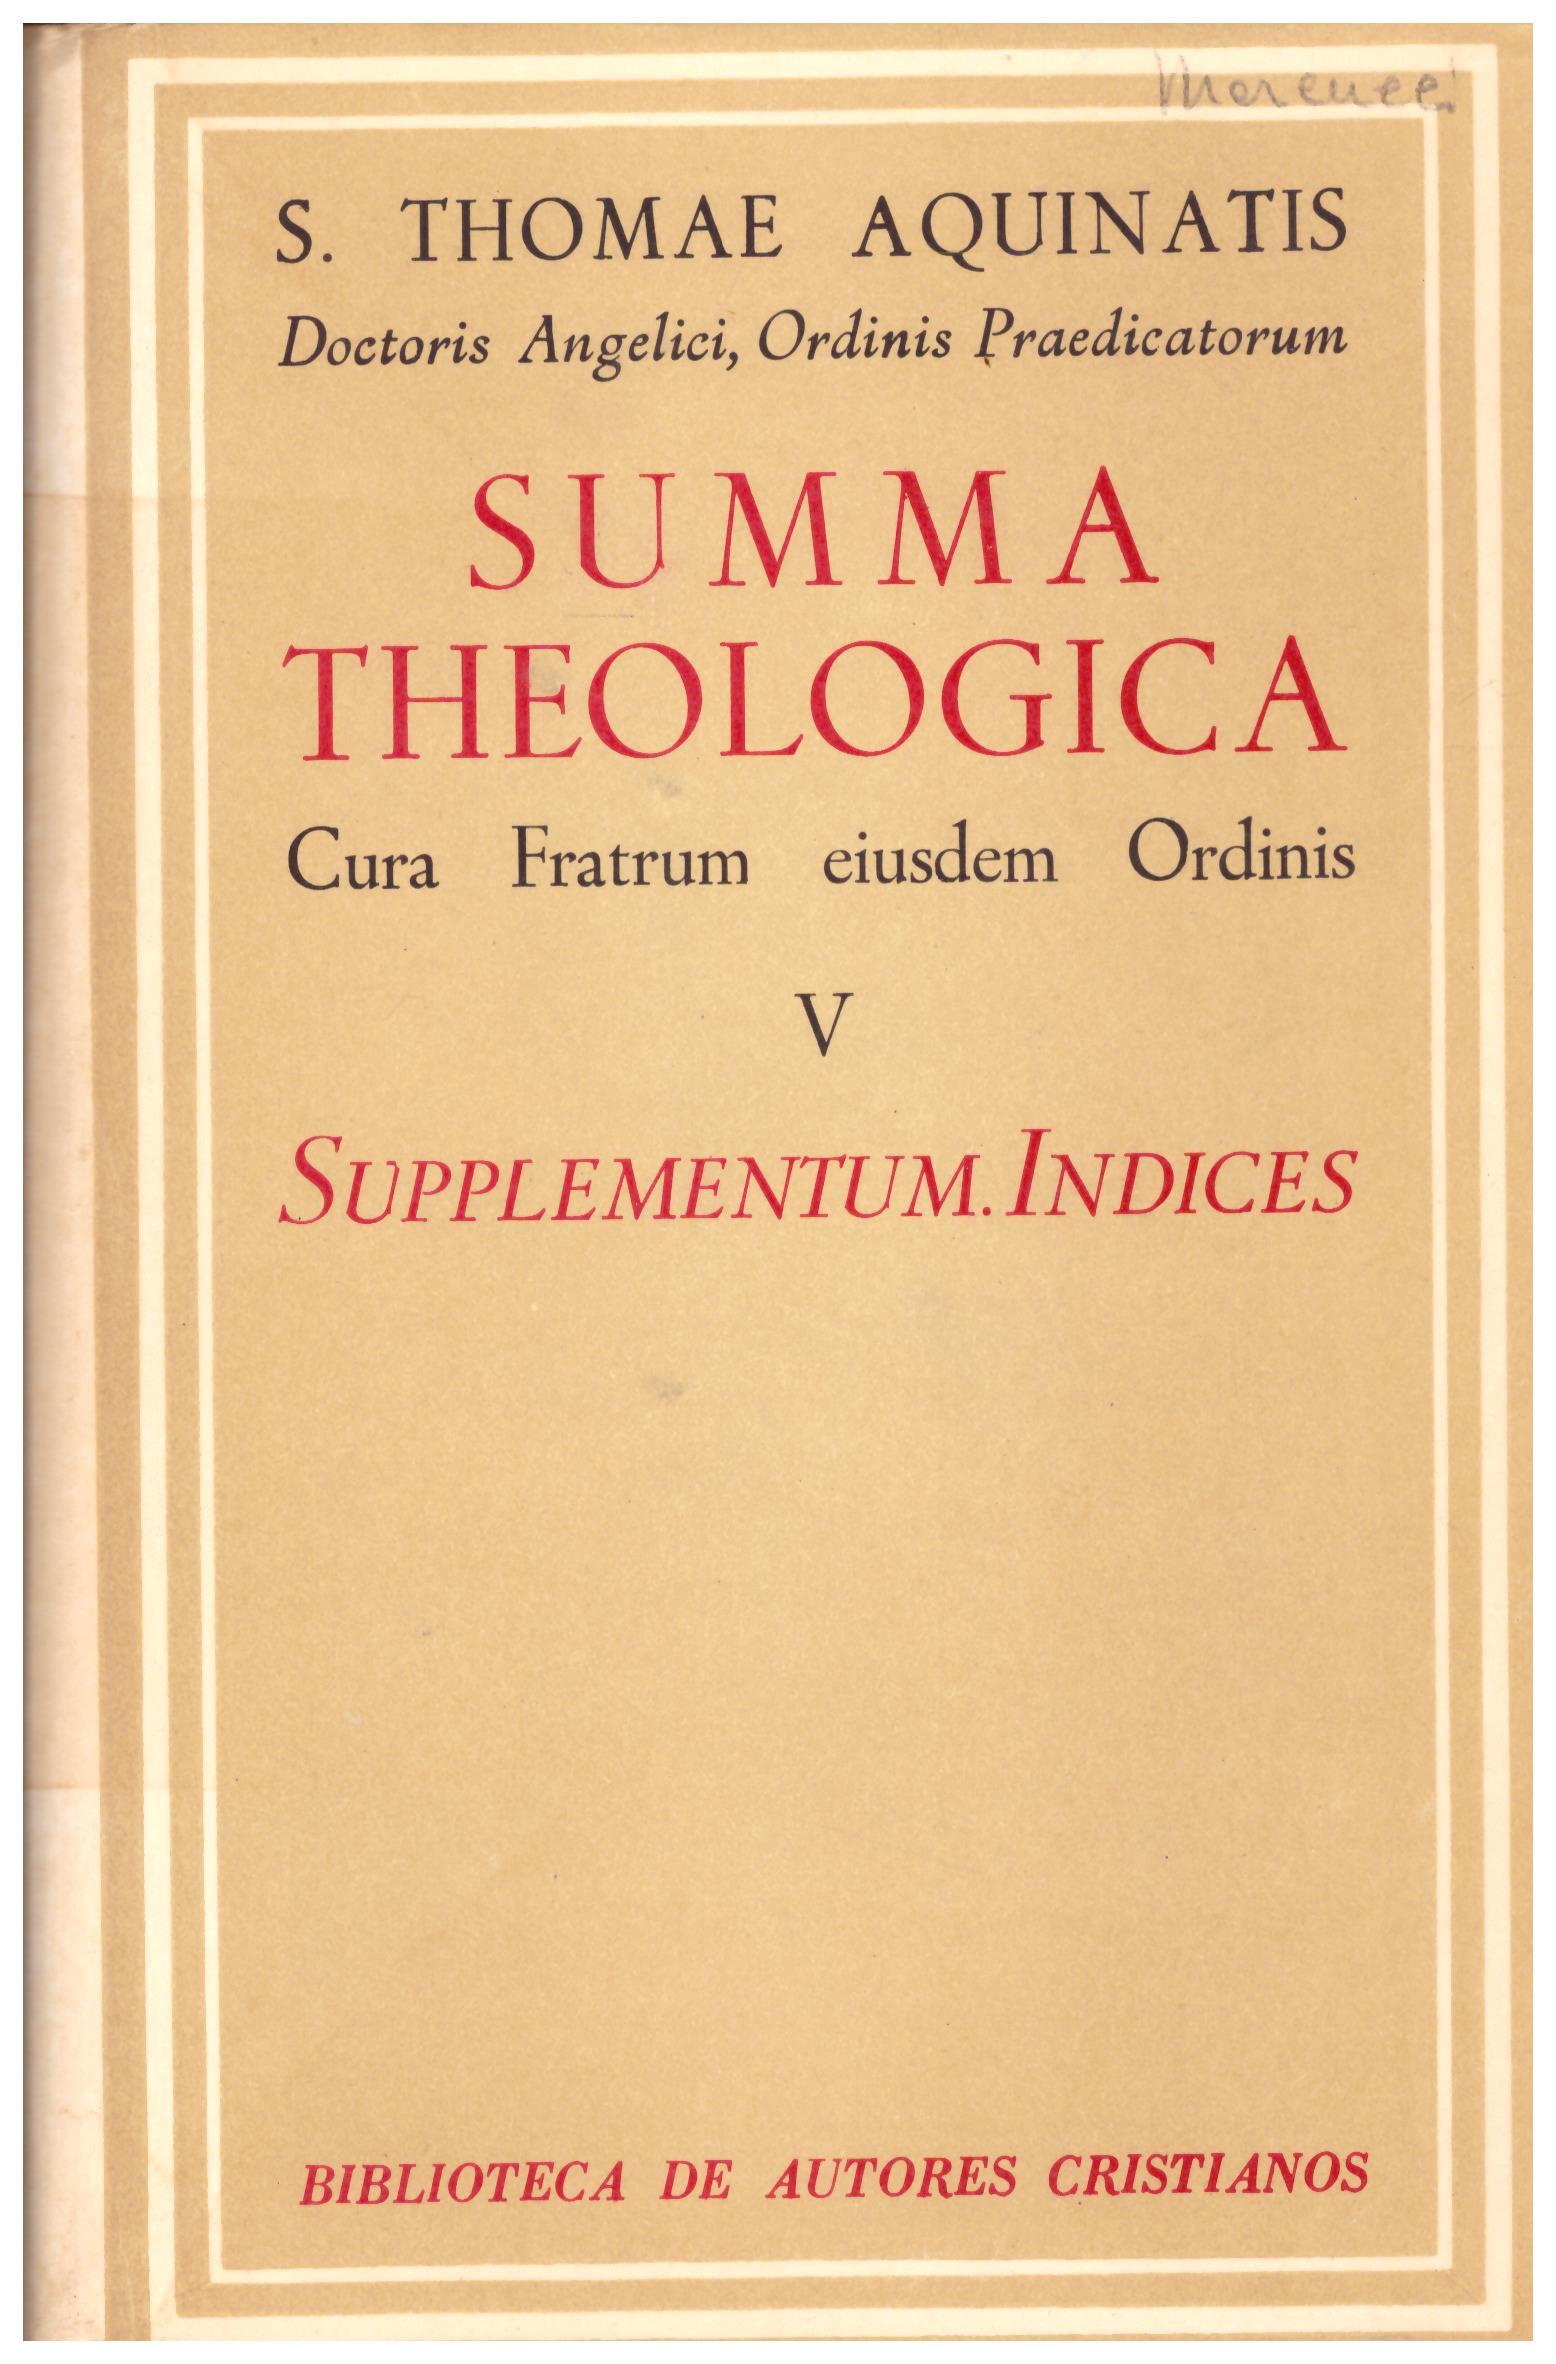 Titolo: Summa theologica in 5 volumi Autore : S. Thomae Aquinatis  Editore: biblioteca de autores cristianos, 1951 Madrid